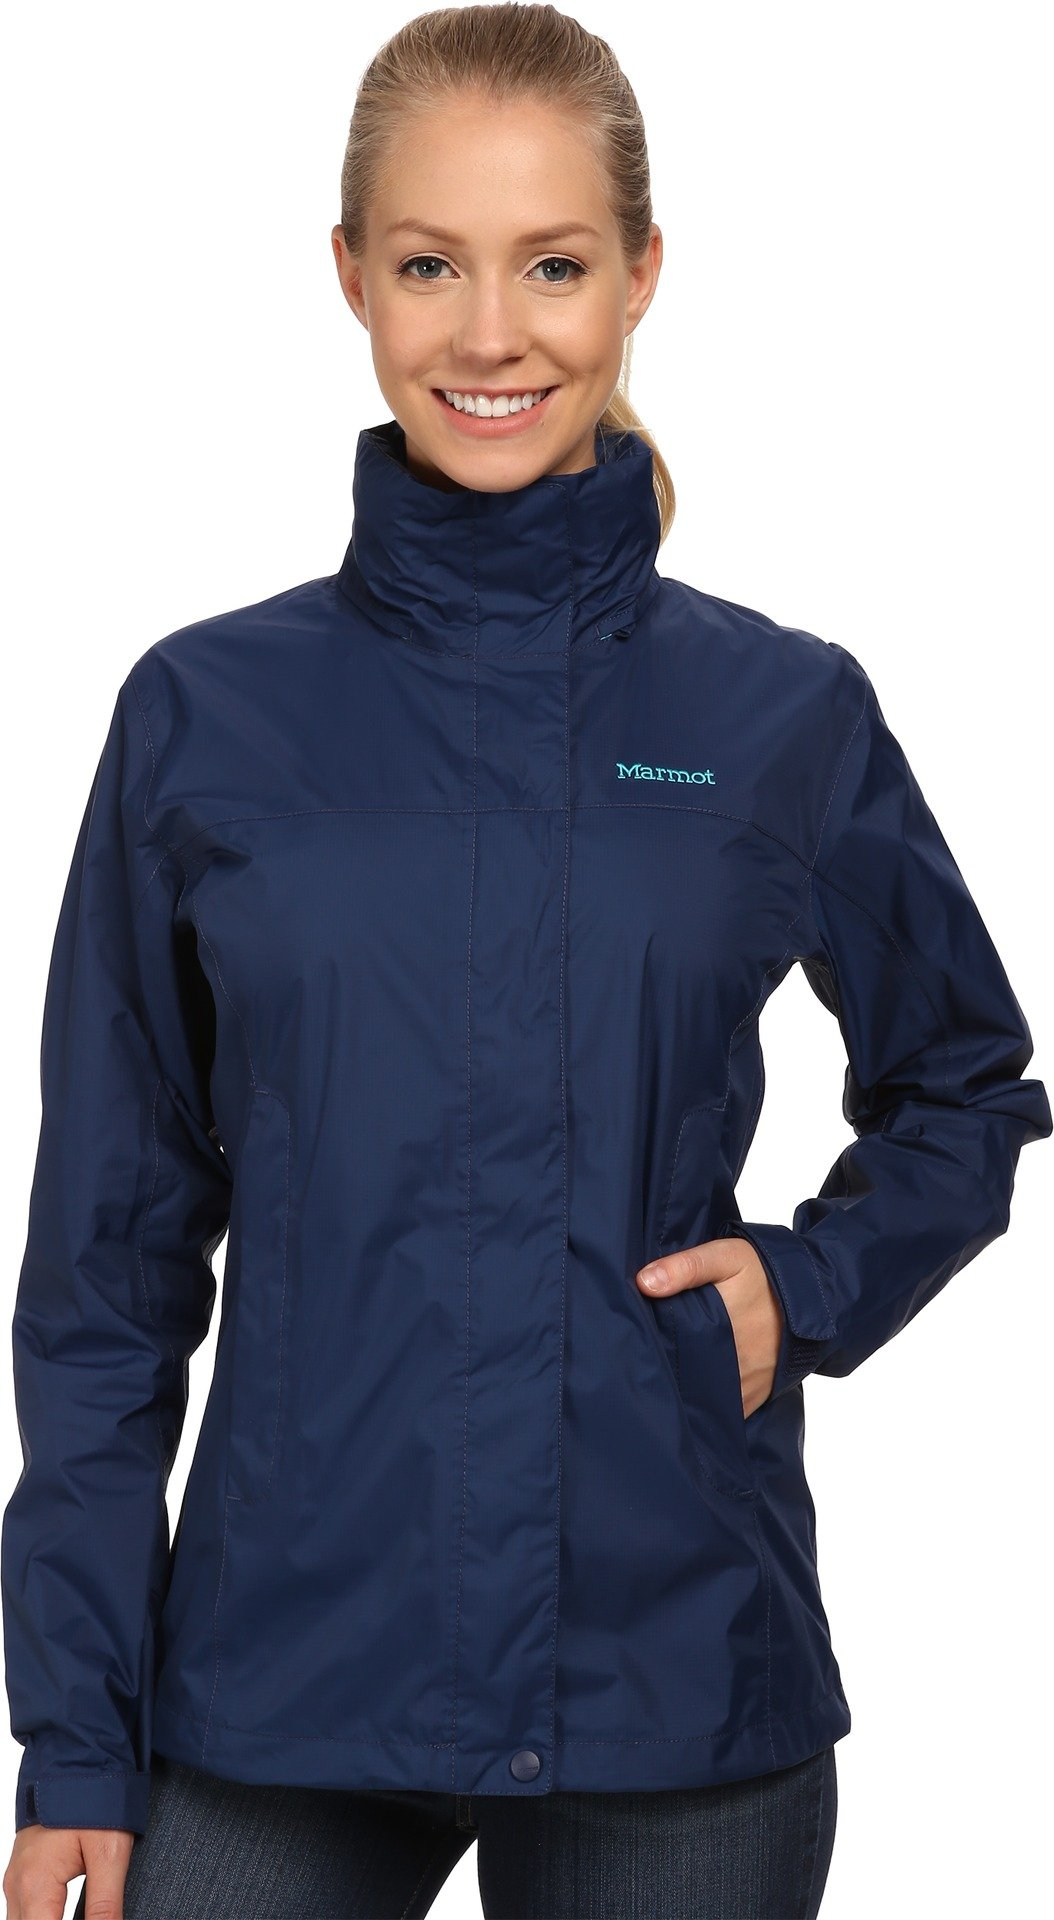 Marmot PreCip Women's Lightweight Waterproof Rain Jacket, Arctic Navy, X-Large